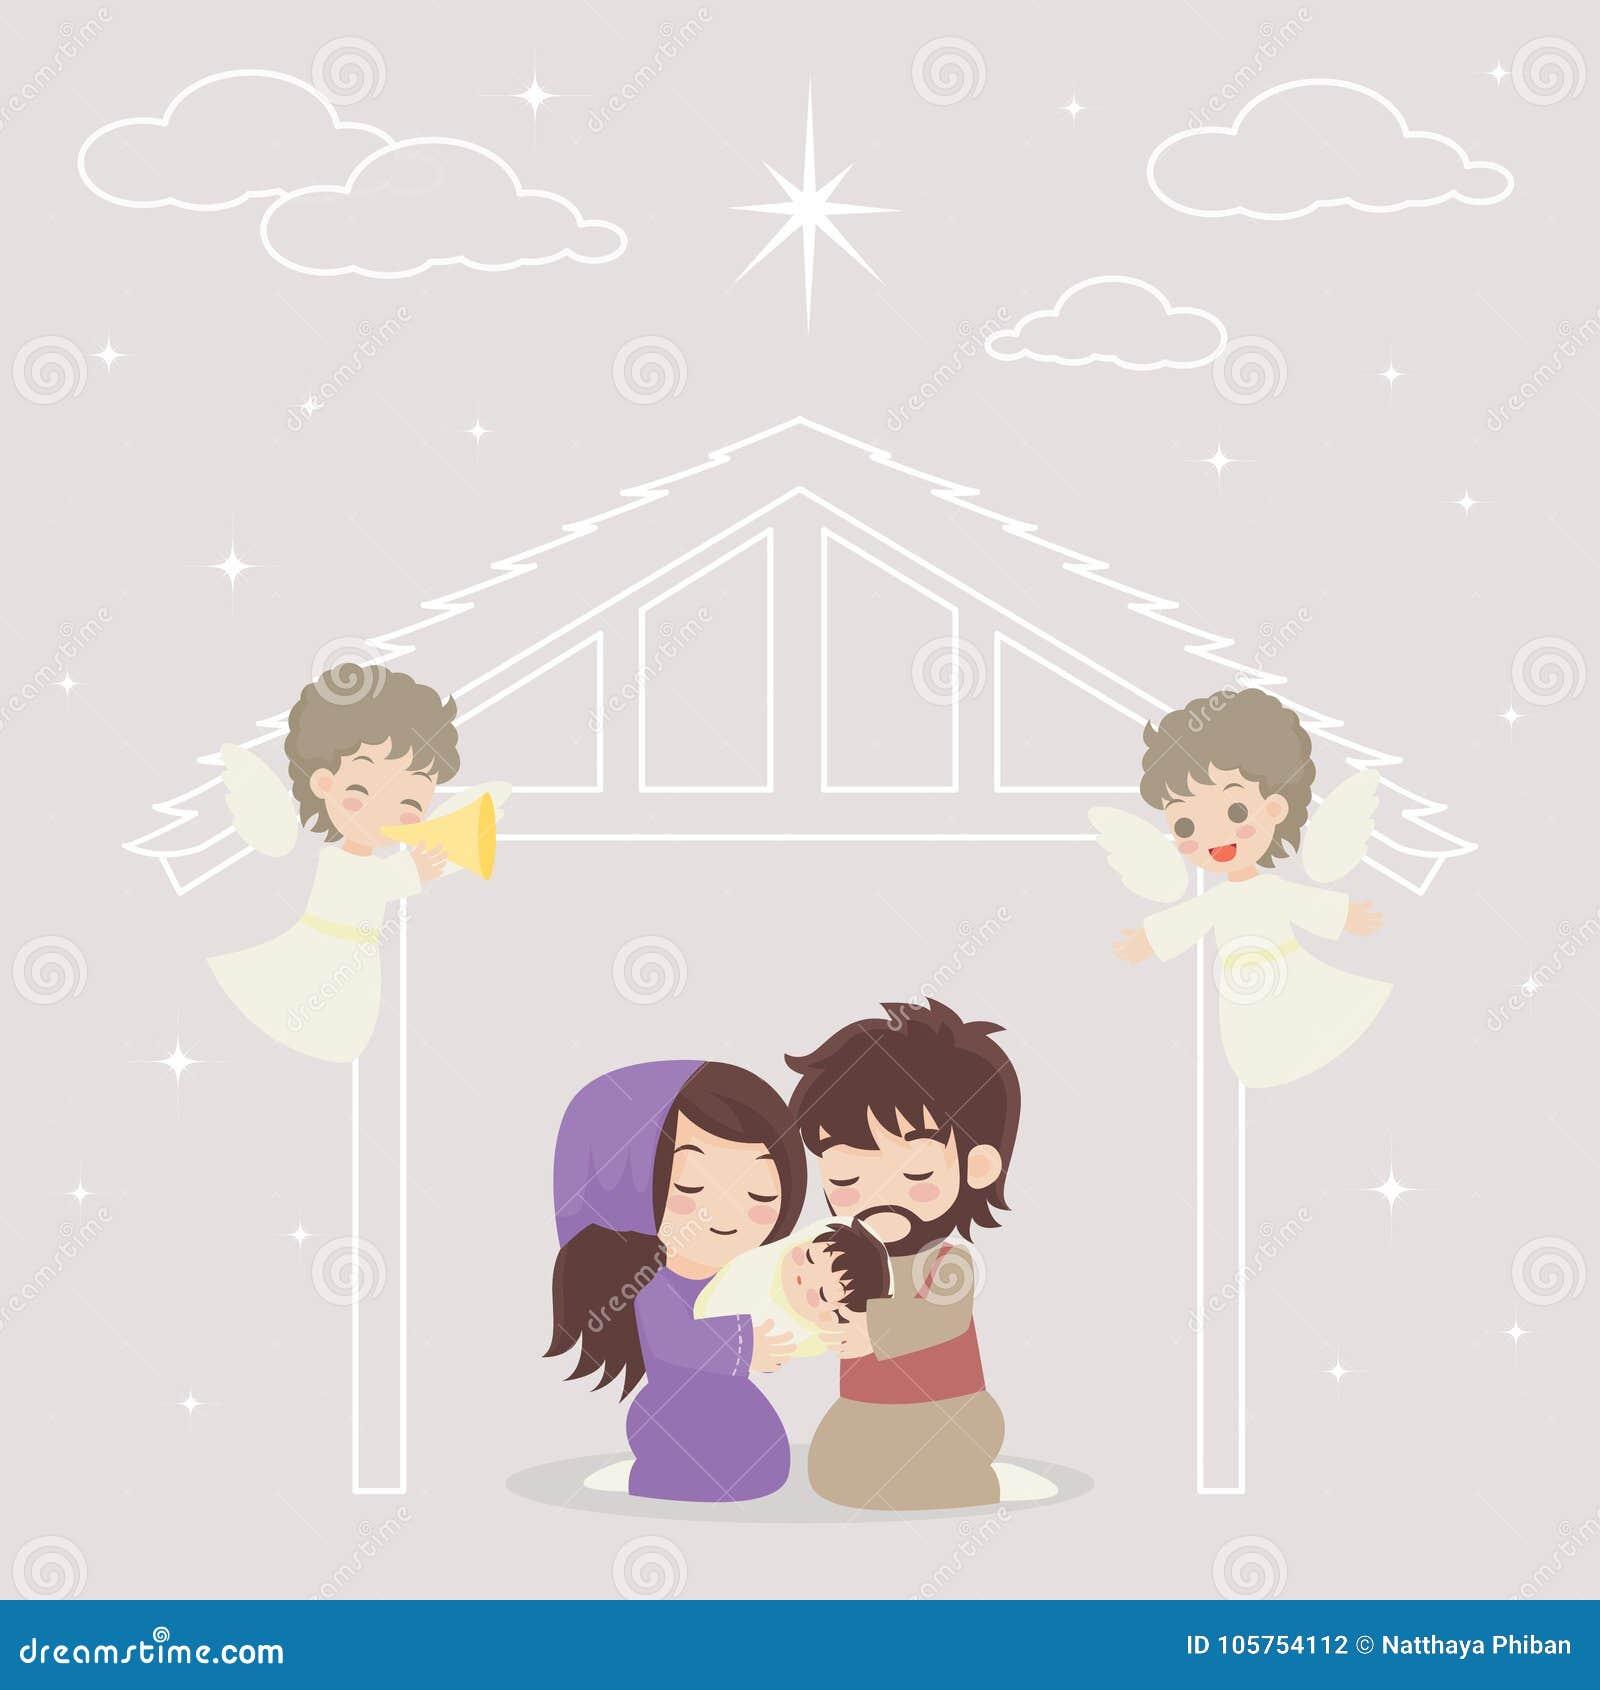 Jesus Story stock vector. Illustration of merry, design - 105754112